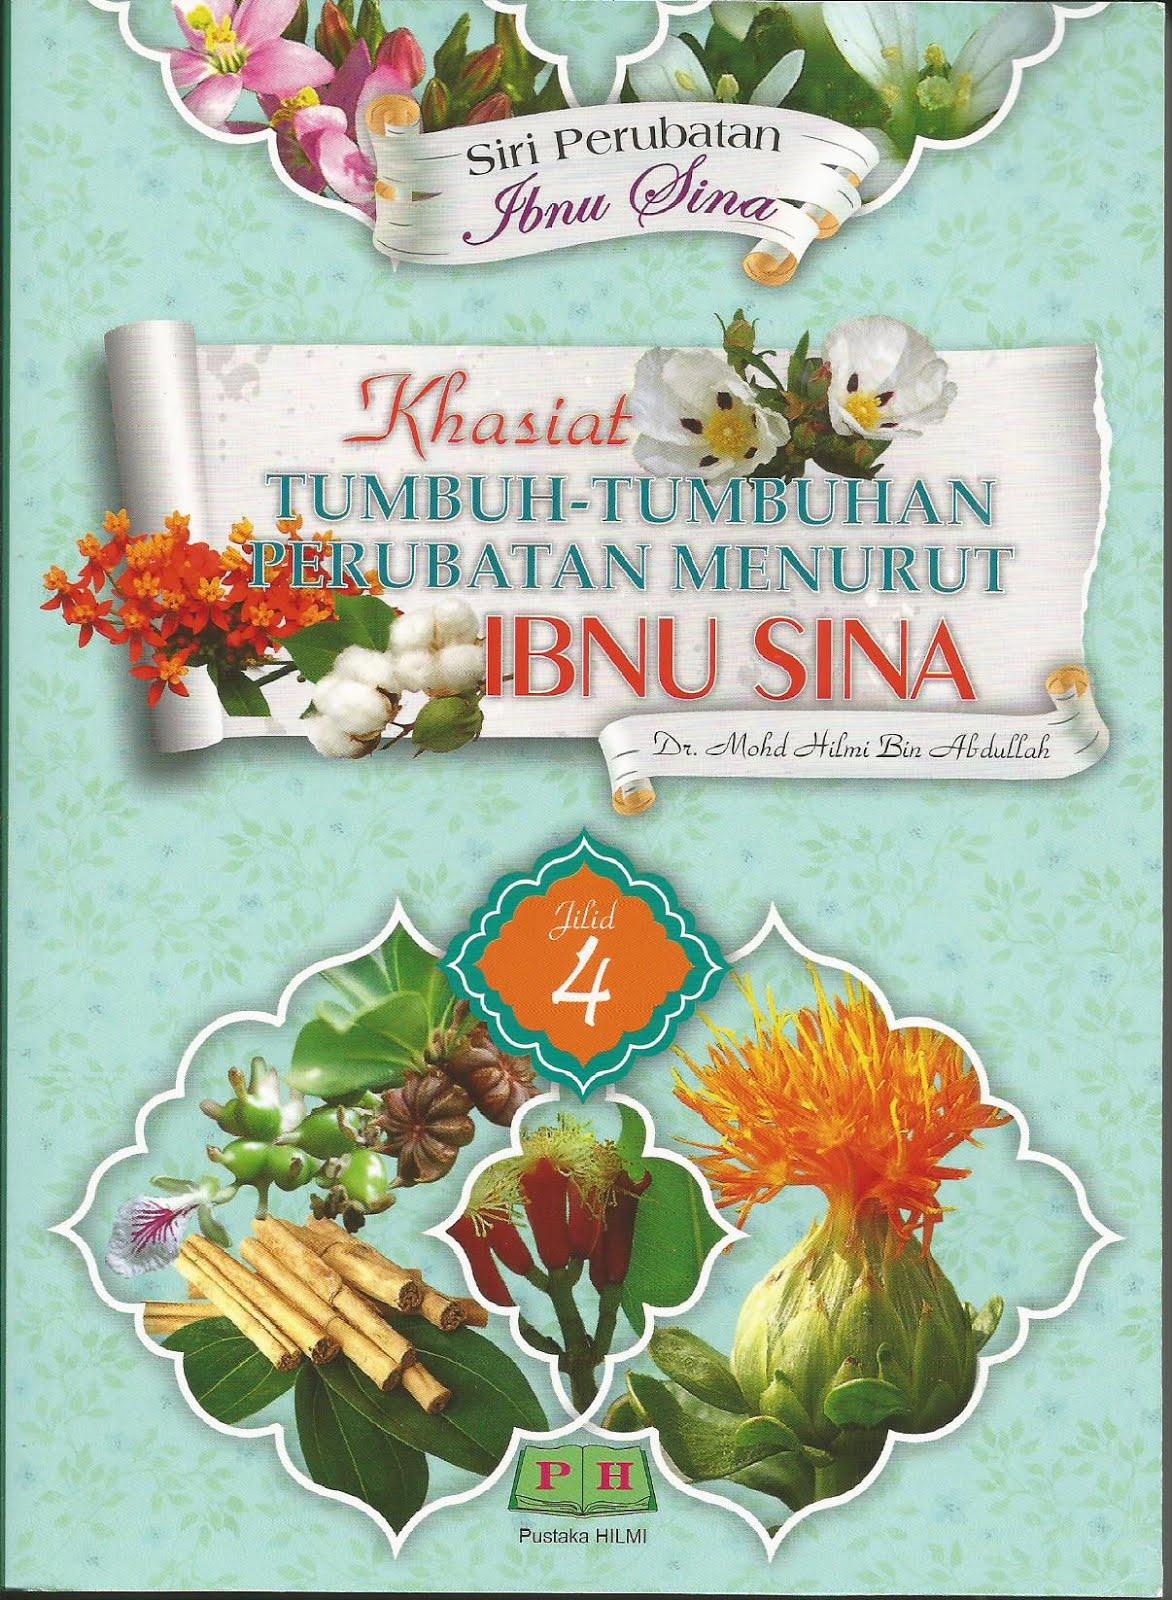 Khasiat Tumbuh-Tumbuhan Perubatan Menurut Ibnu Sina (Jilid 4)